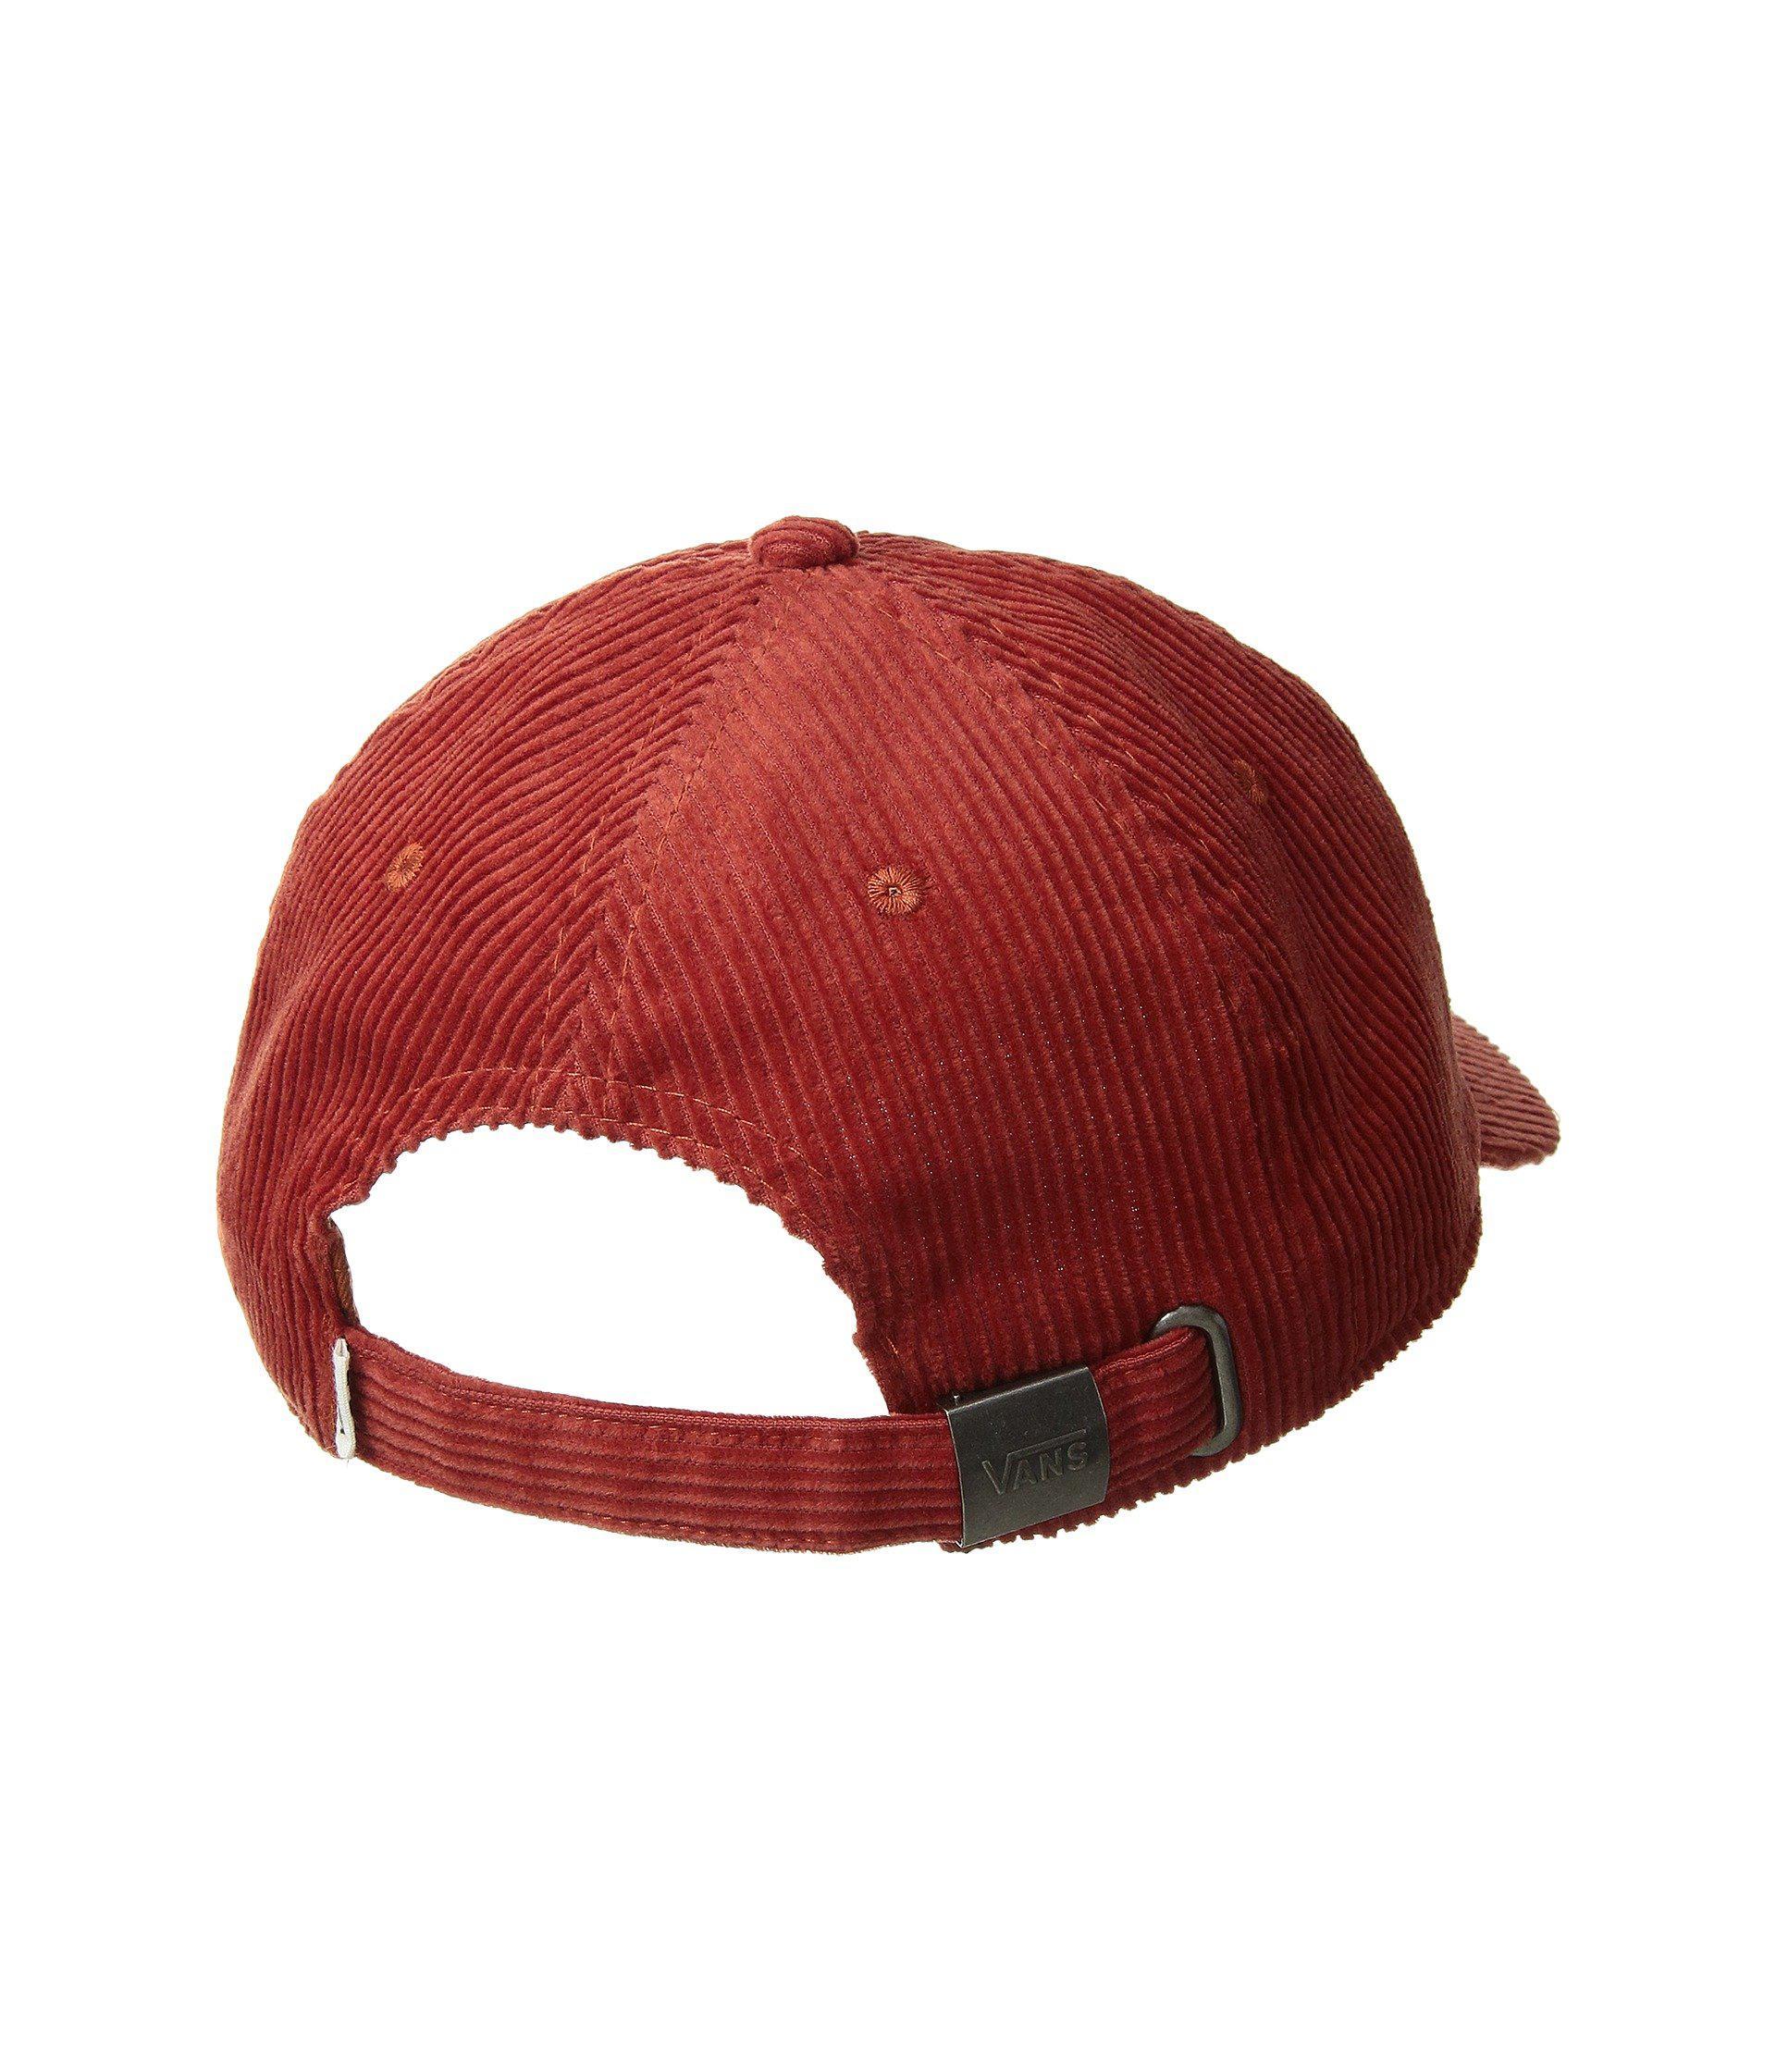 37789a364f Vans Red Summit Court Side Hat (black) Baseball Caps